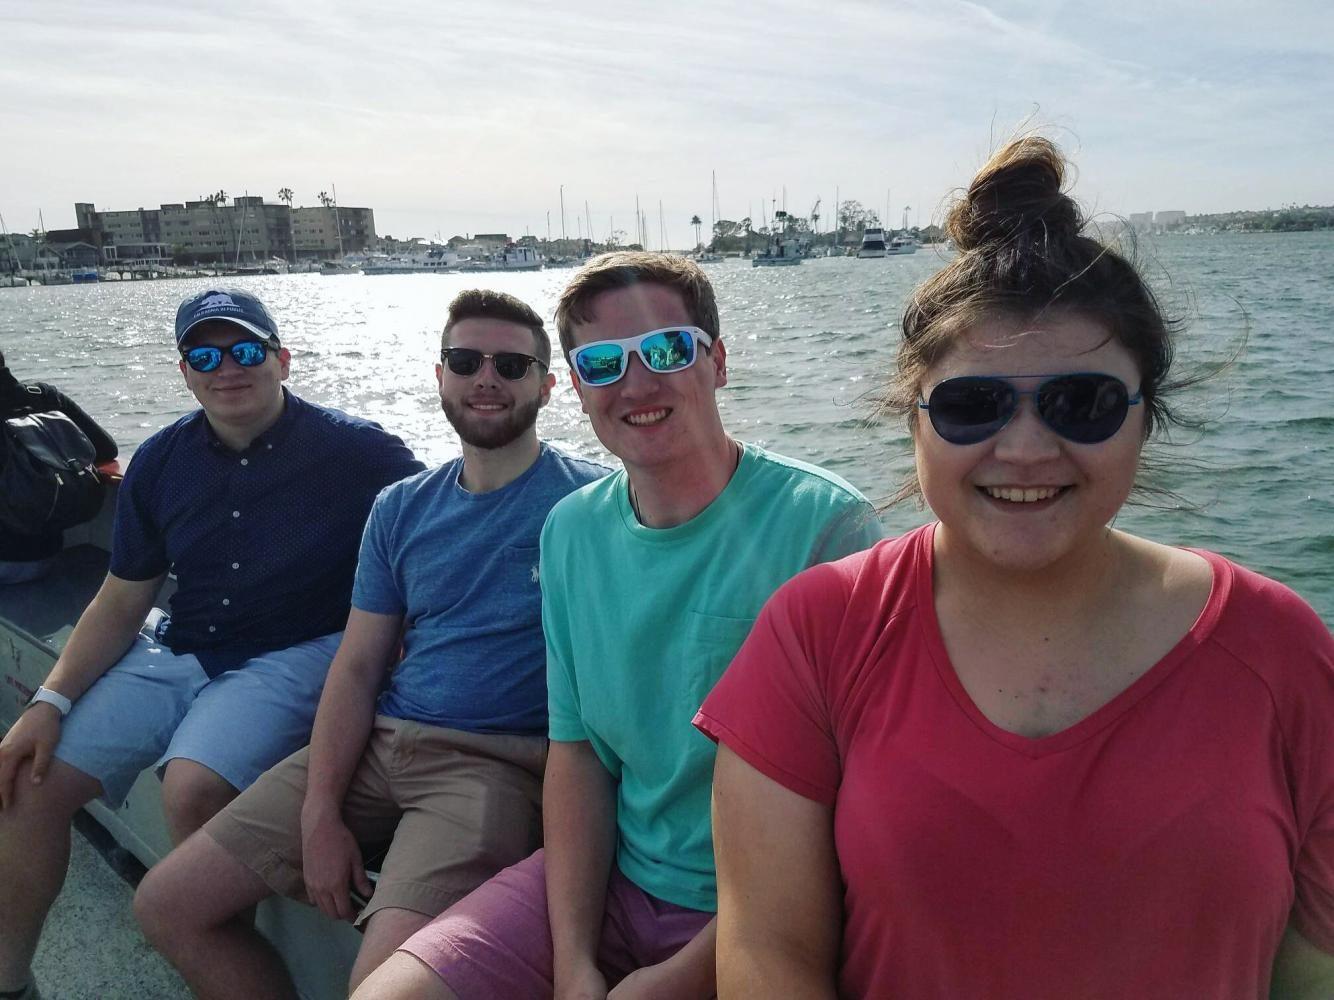 DECA members junior Daniel White, senior Avery Sayre, senior Devin Daley and junior Rachel DeCesaris ride the ferry in sunny Newport Beach, California.